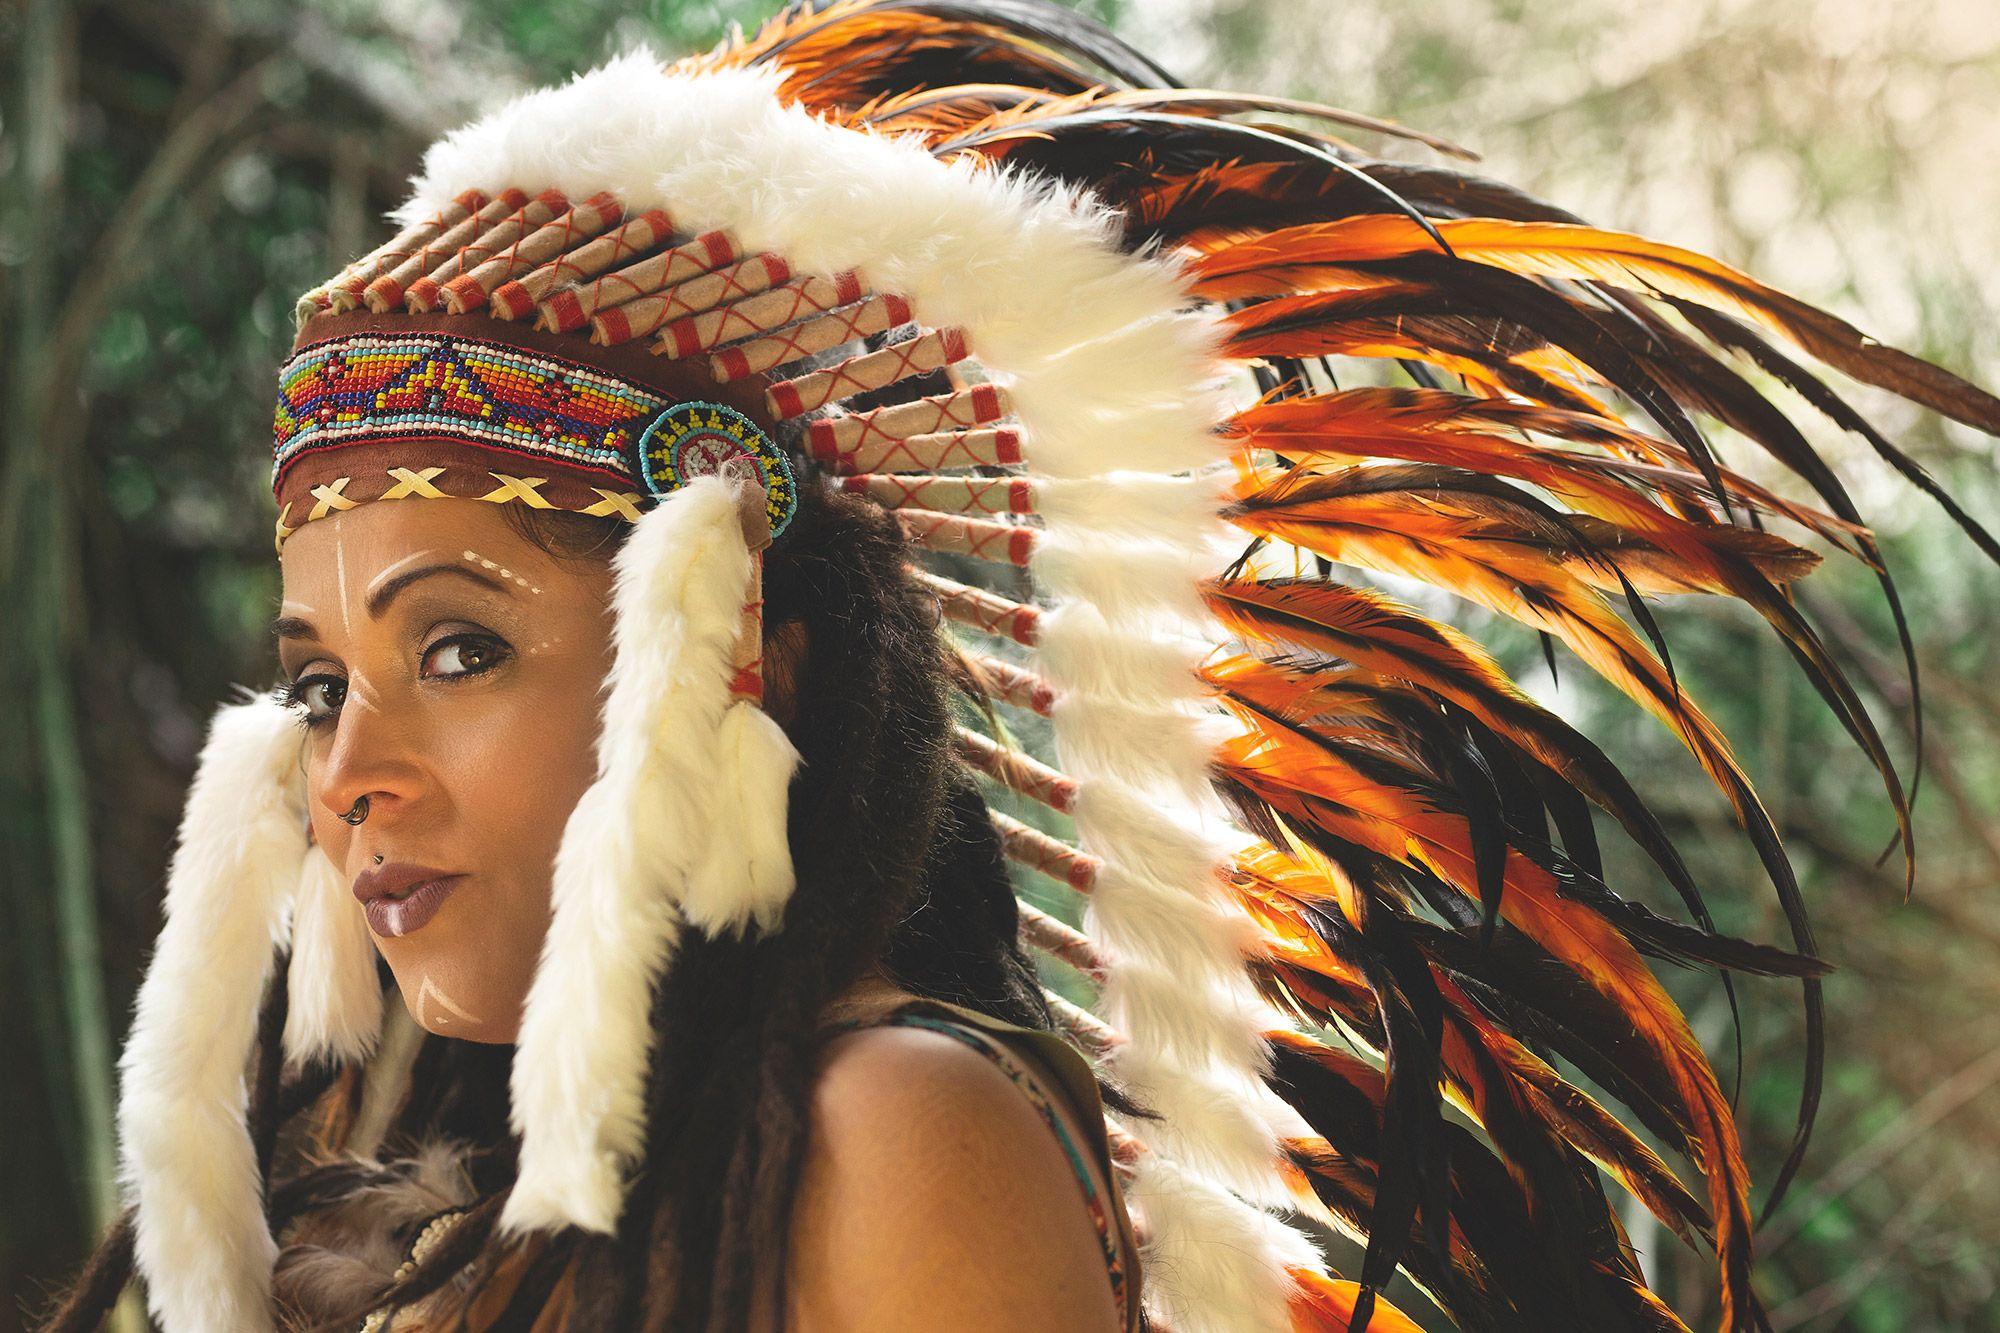 Fotos Carnavales Sesion Kirikolatz Bizkaia Retrato